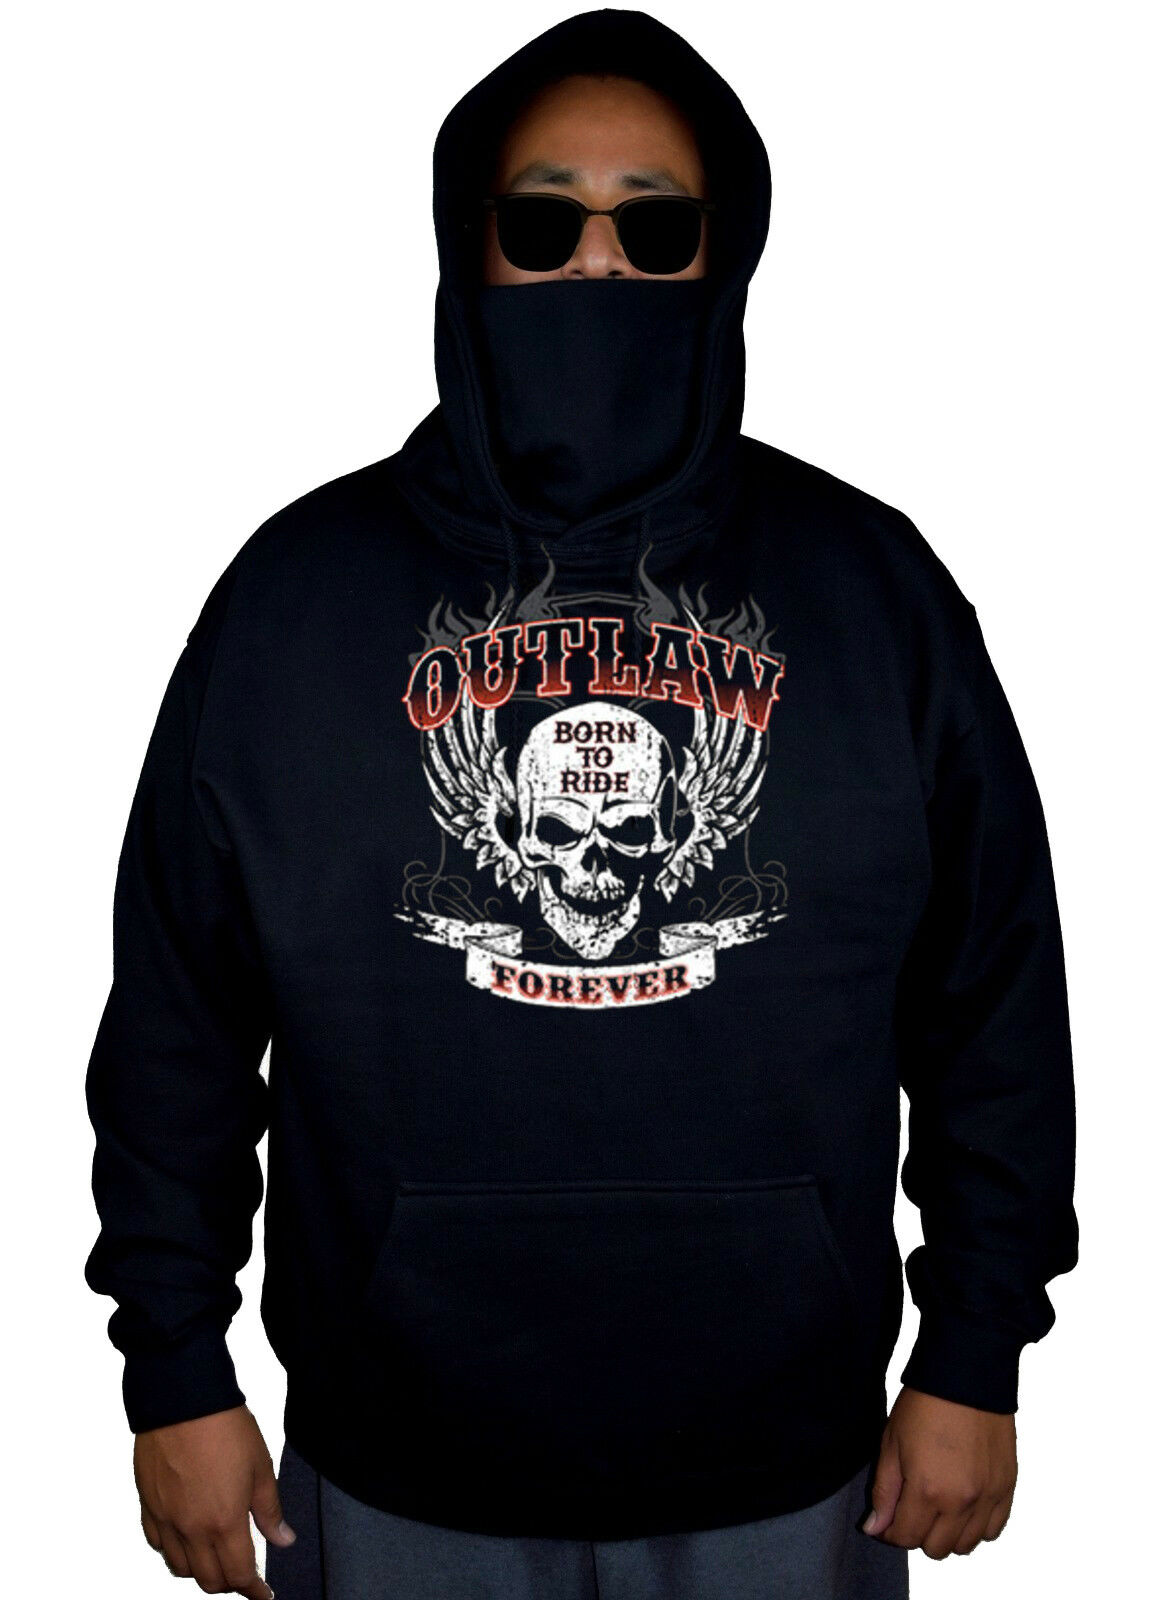 New Men's Outlaw Forever Skull Mask Hoodie Sweater Motorcycle Biker Gang Ride